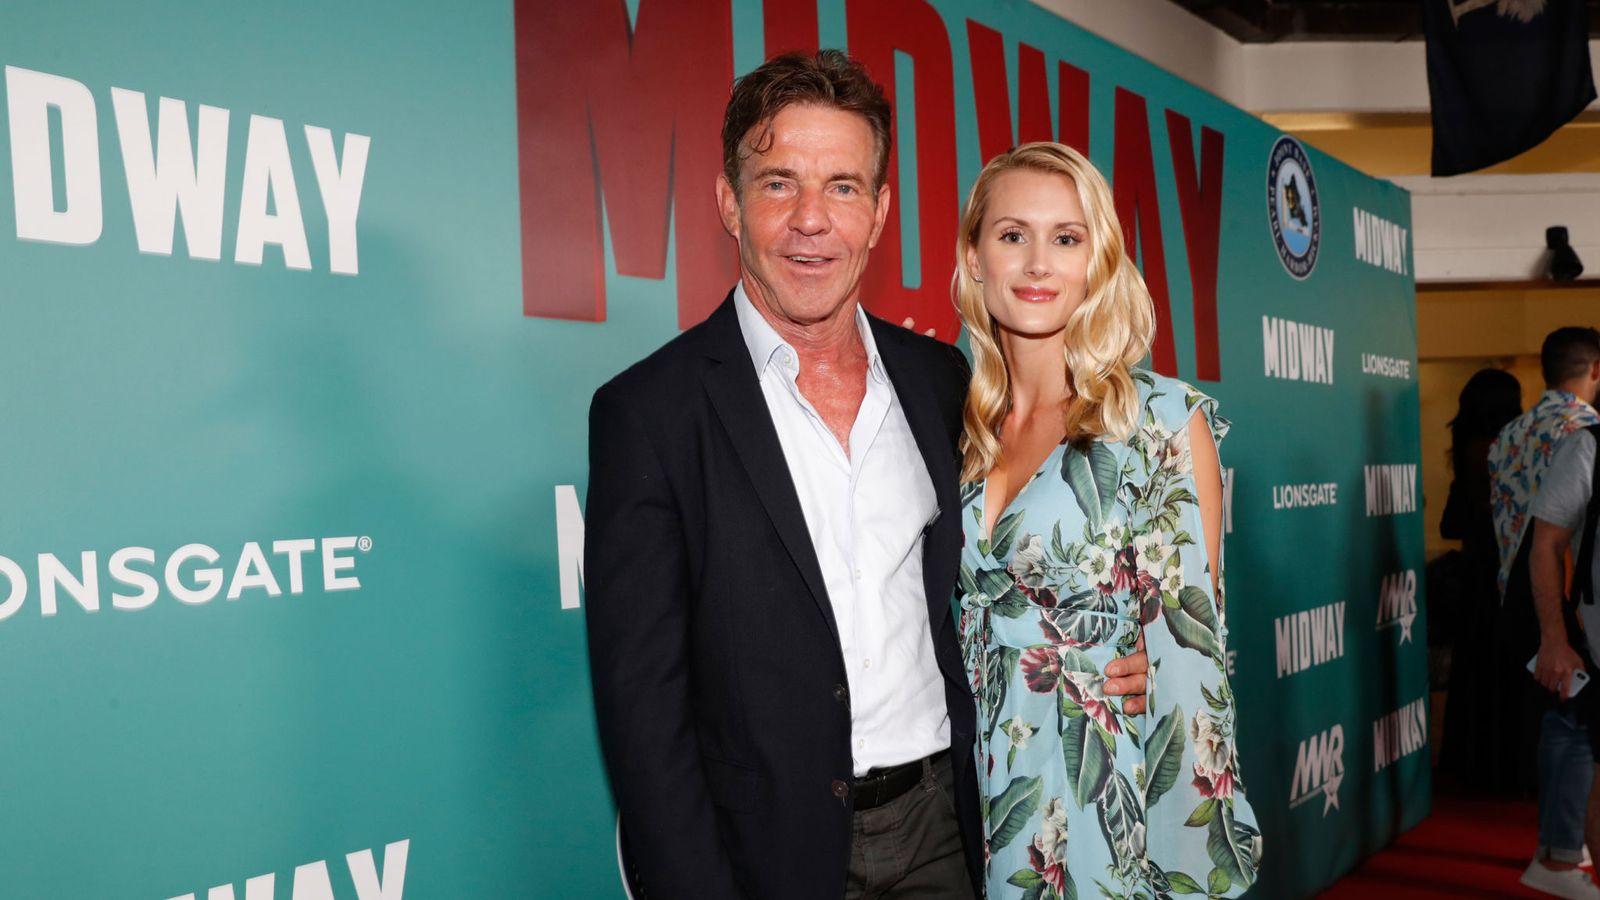 Actor Dennis Quaid announces engagement to 26-year-old girlfriend Laura Savoie 1